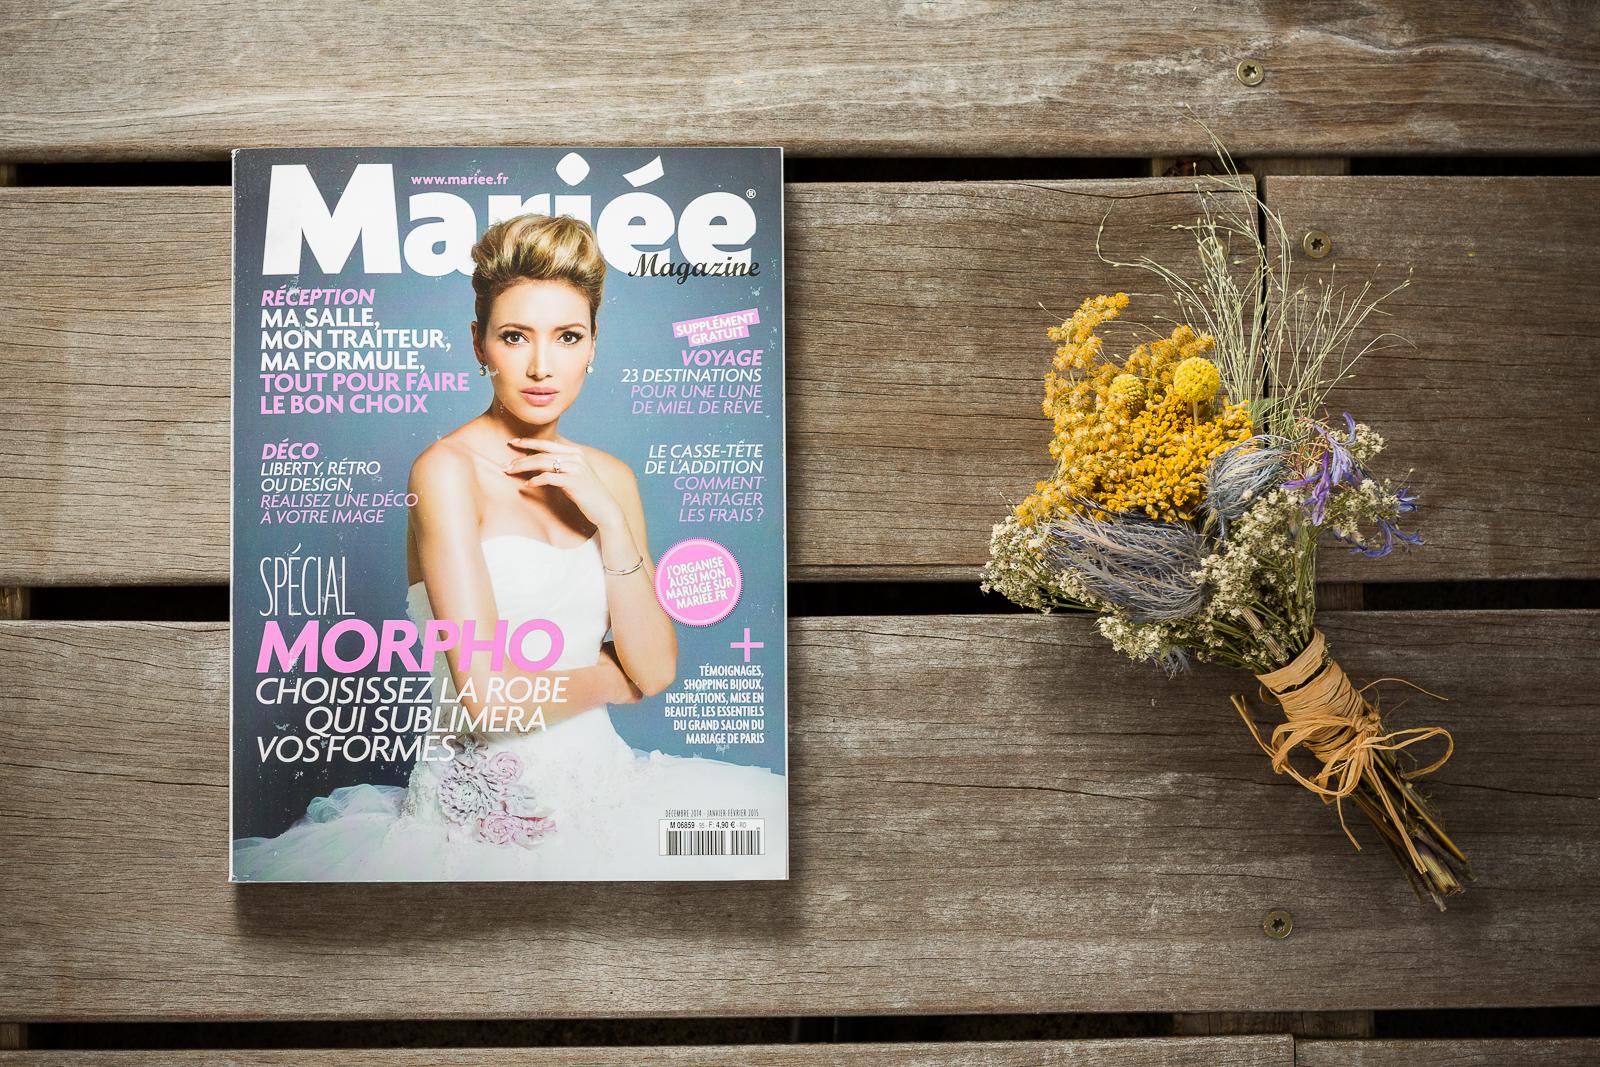 Mariée magazine - presse - les crâneuses